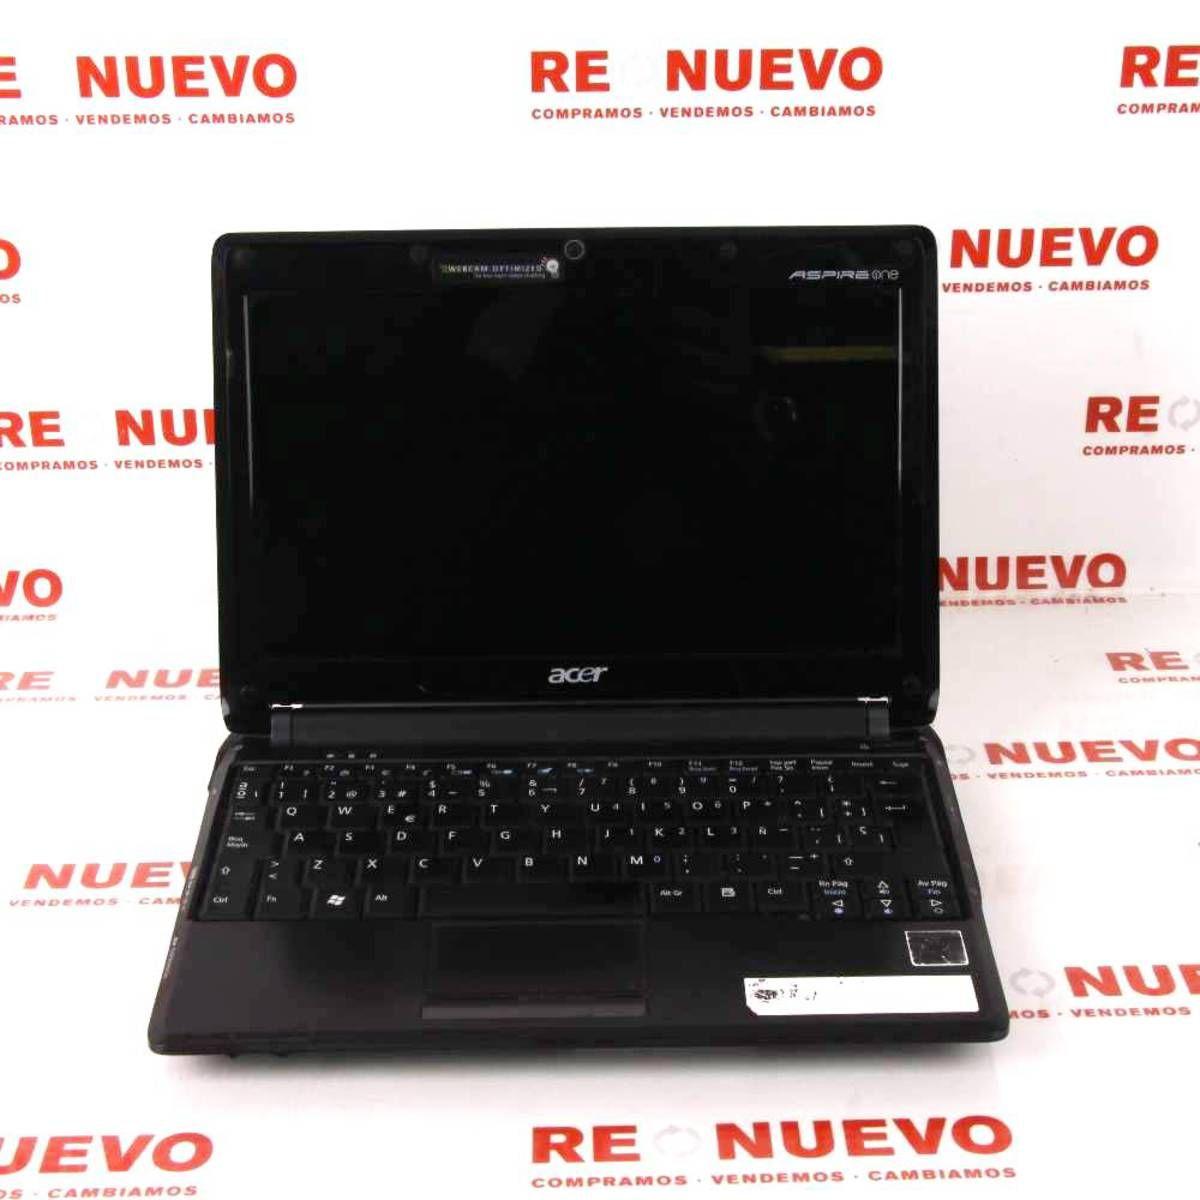 Portatil Mini Acer Zg8 Portatil De Segunda Mano Acer Acer Mini